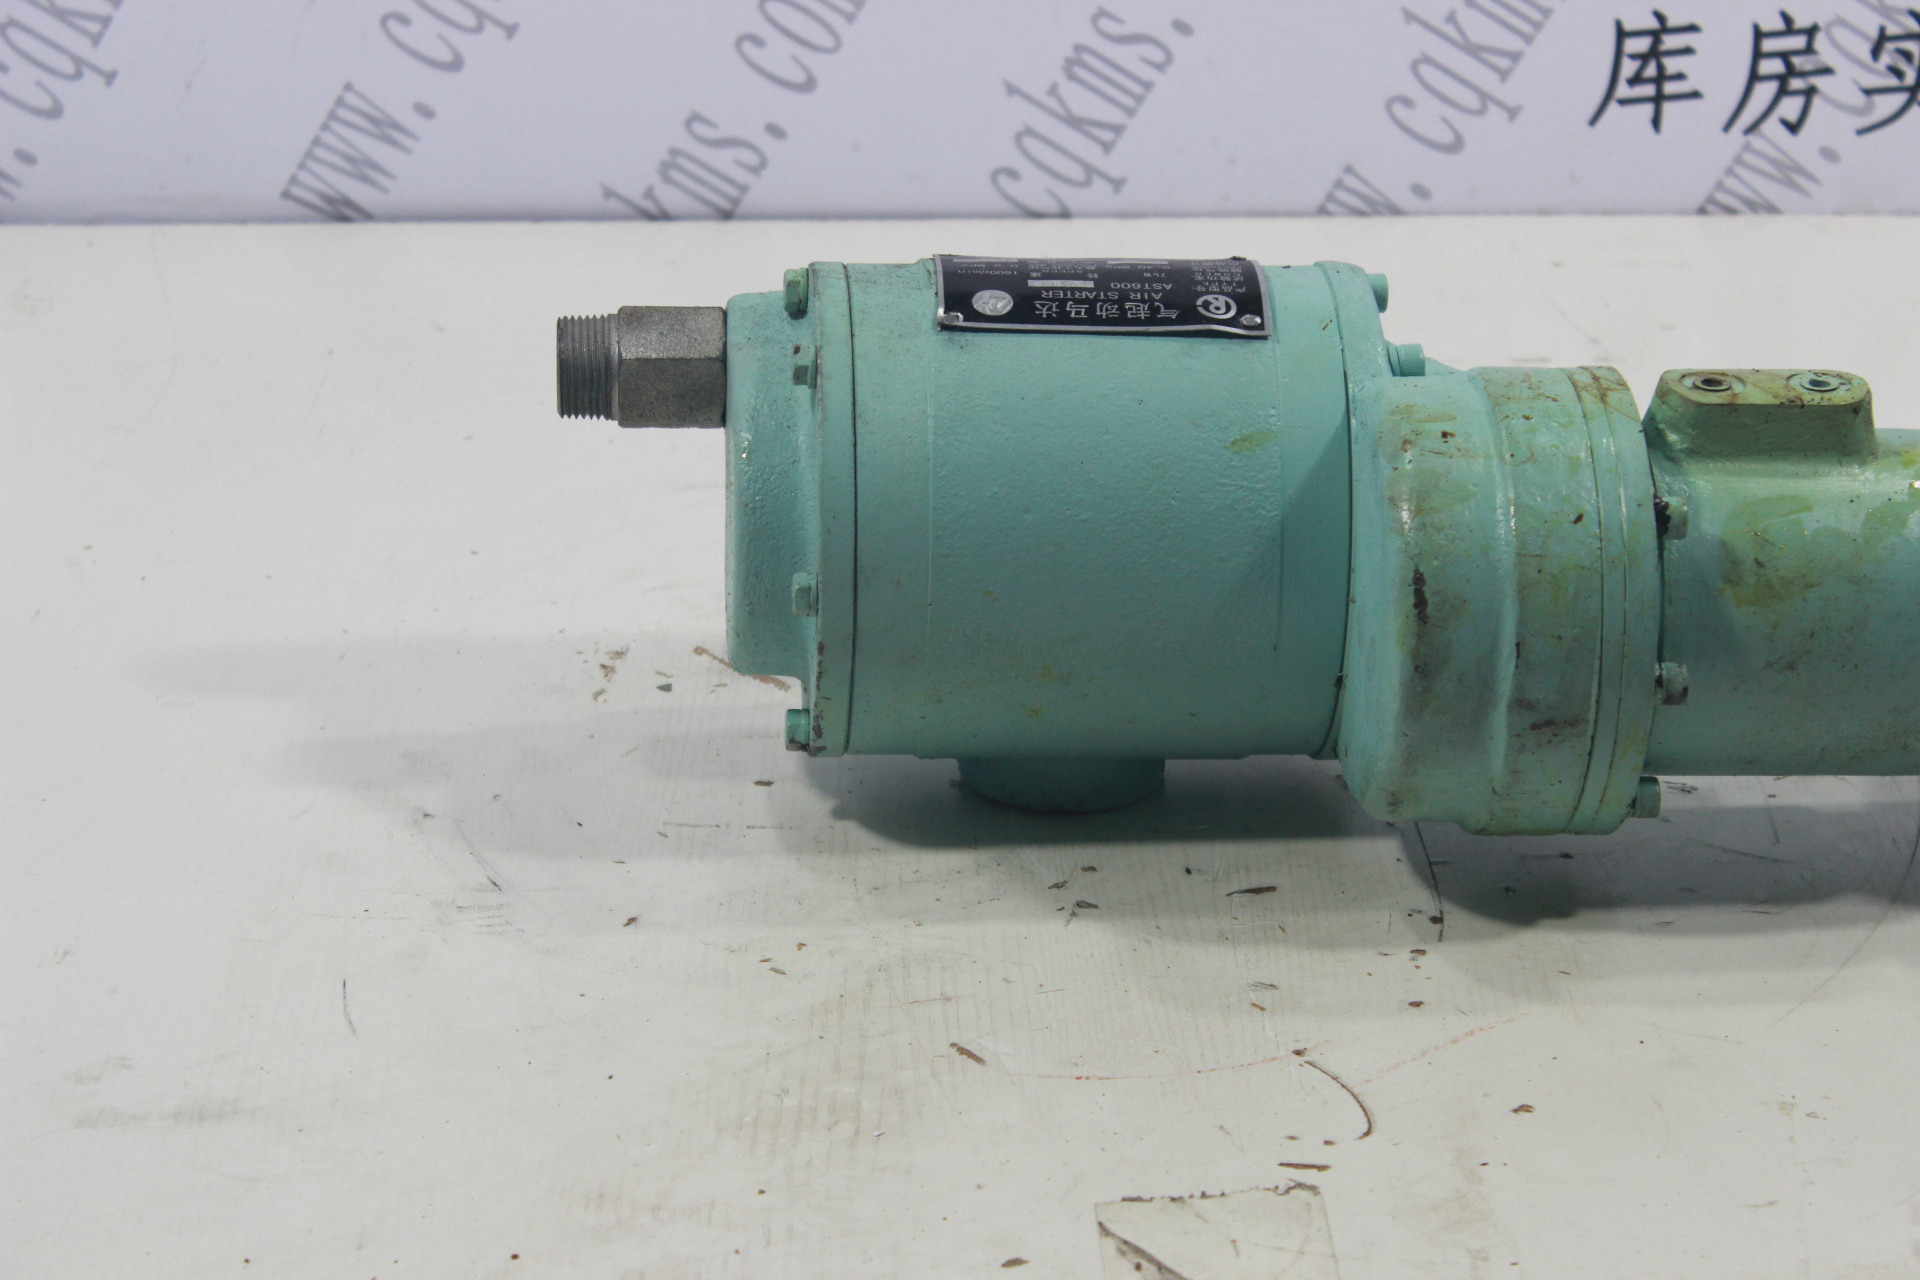 kms00169-AST600A-NT85空气起动马达-用于NT855康明斯发动机-NT855-参考规格49*23*28CM含包装-参考重量40kg净重34.15kg-40kg净重34.15kg图片2